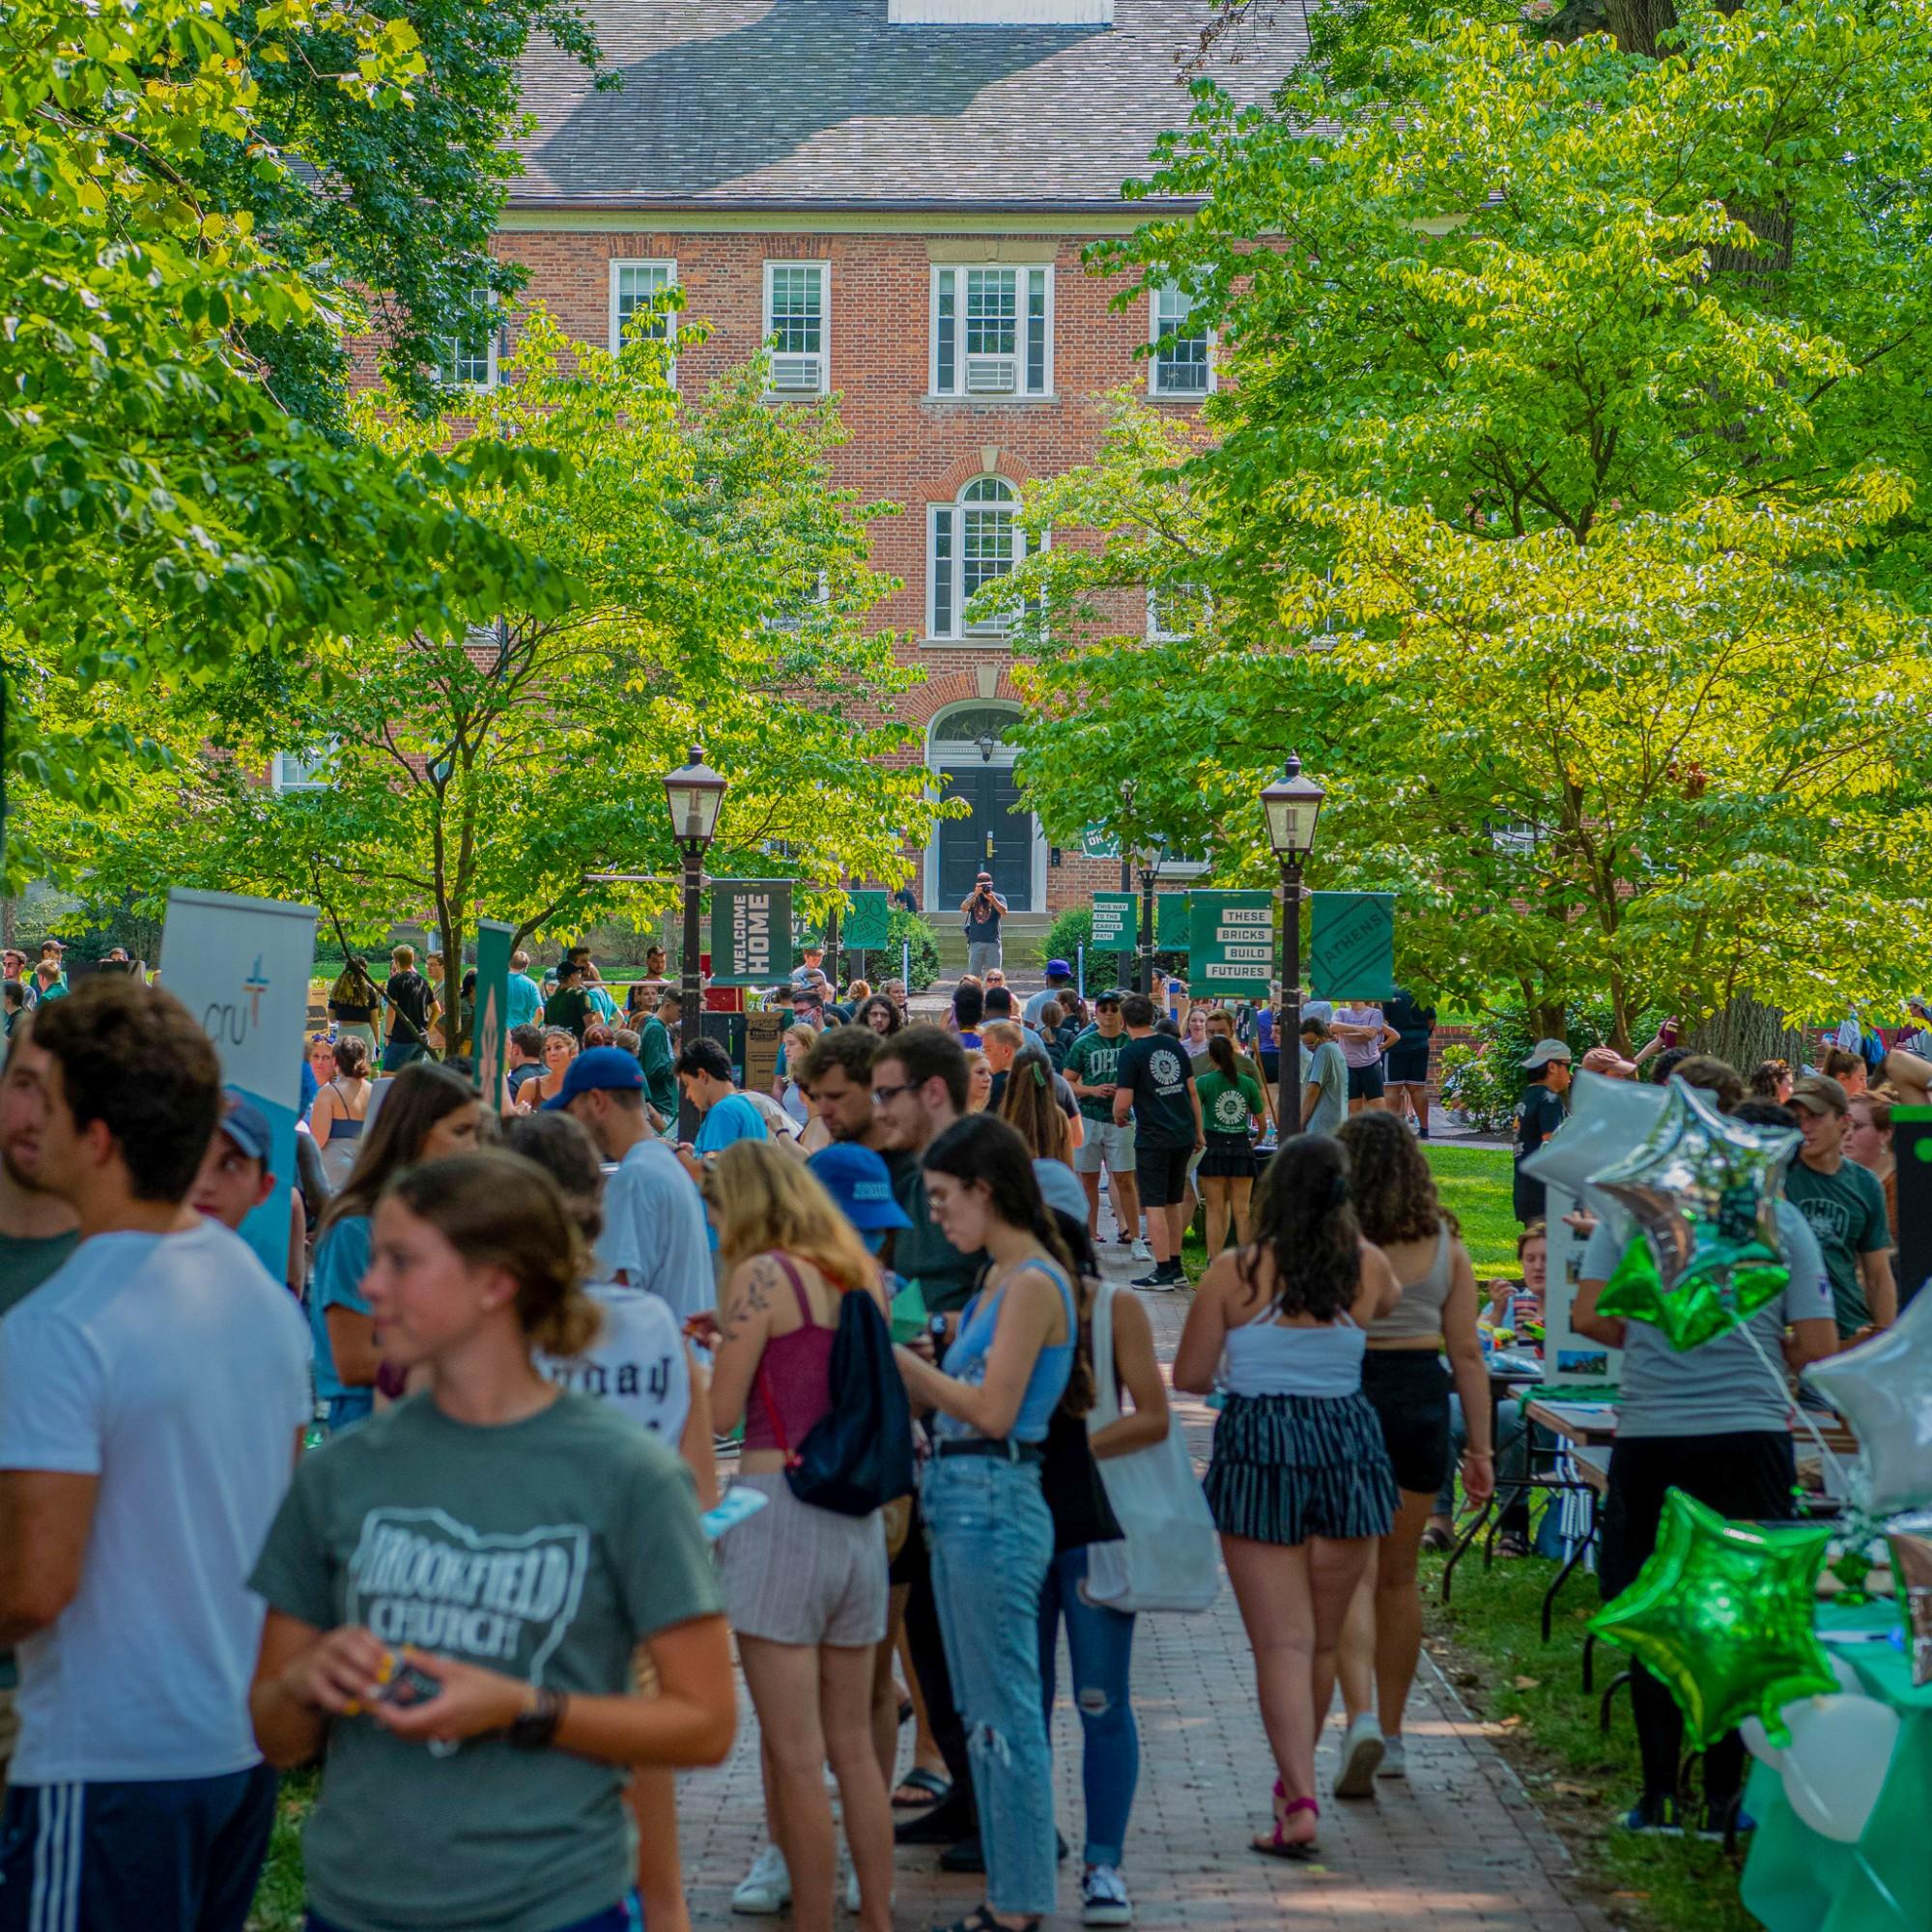 Campus Involvement Fair returns Saturday on College Green. (Photo by Ryan Grzybowski)